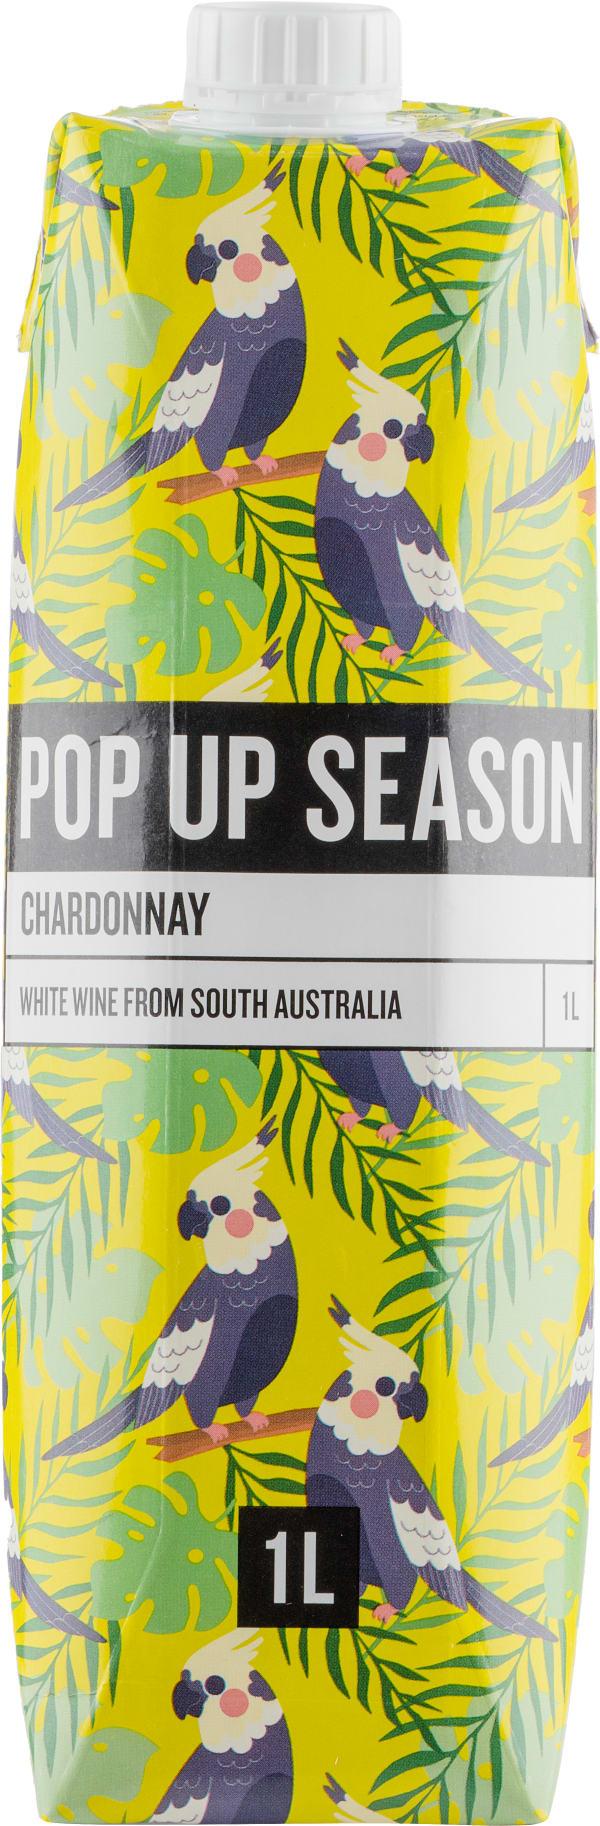 Pop Up Season Chardonnay 2019 carton package